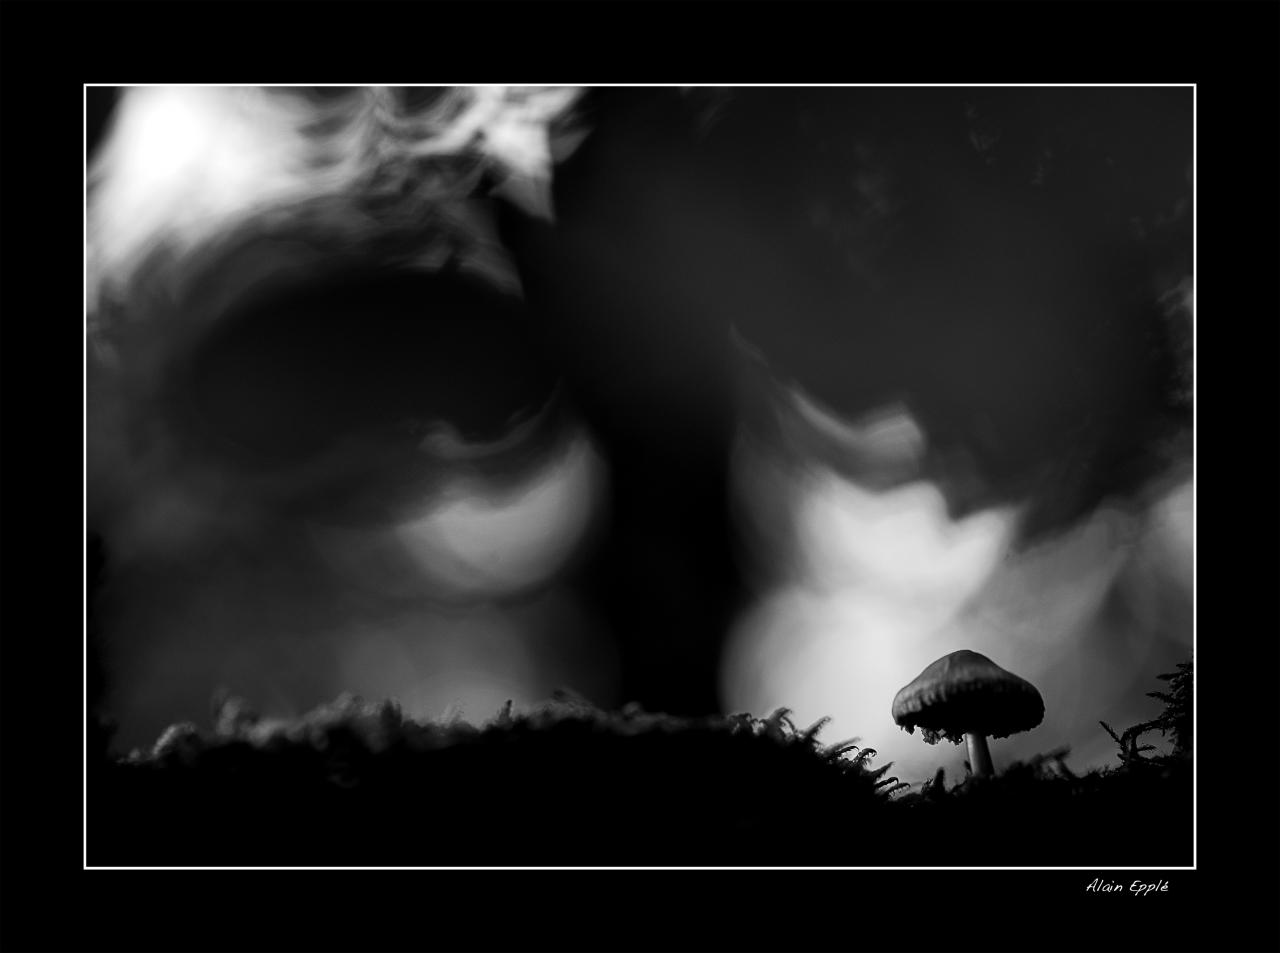 Un oeil noir te regarde - MC9